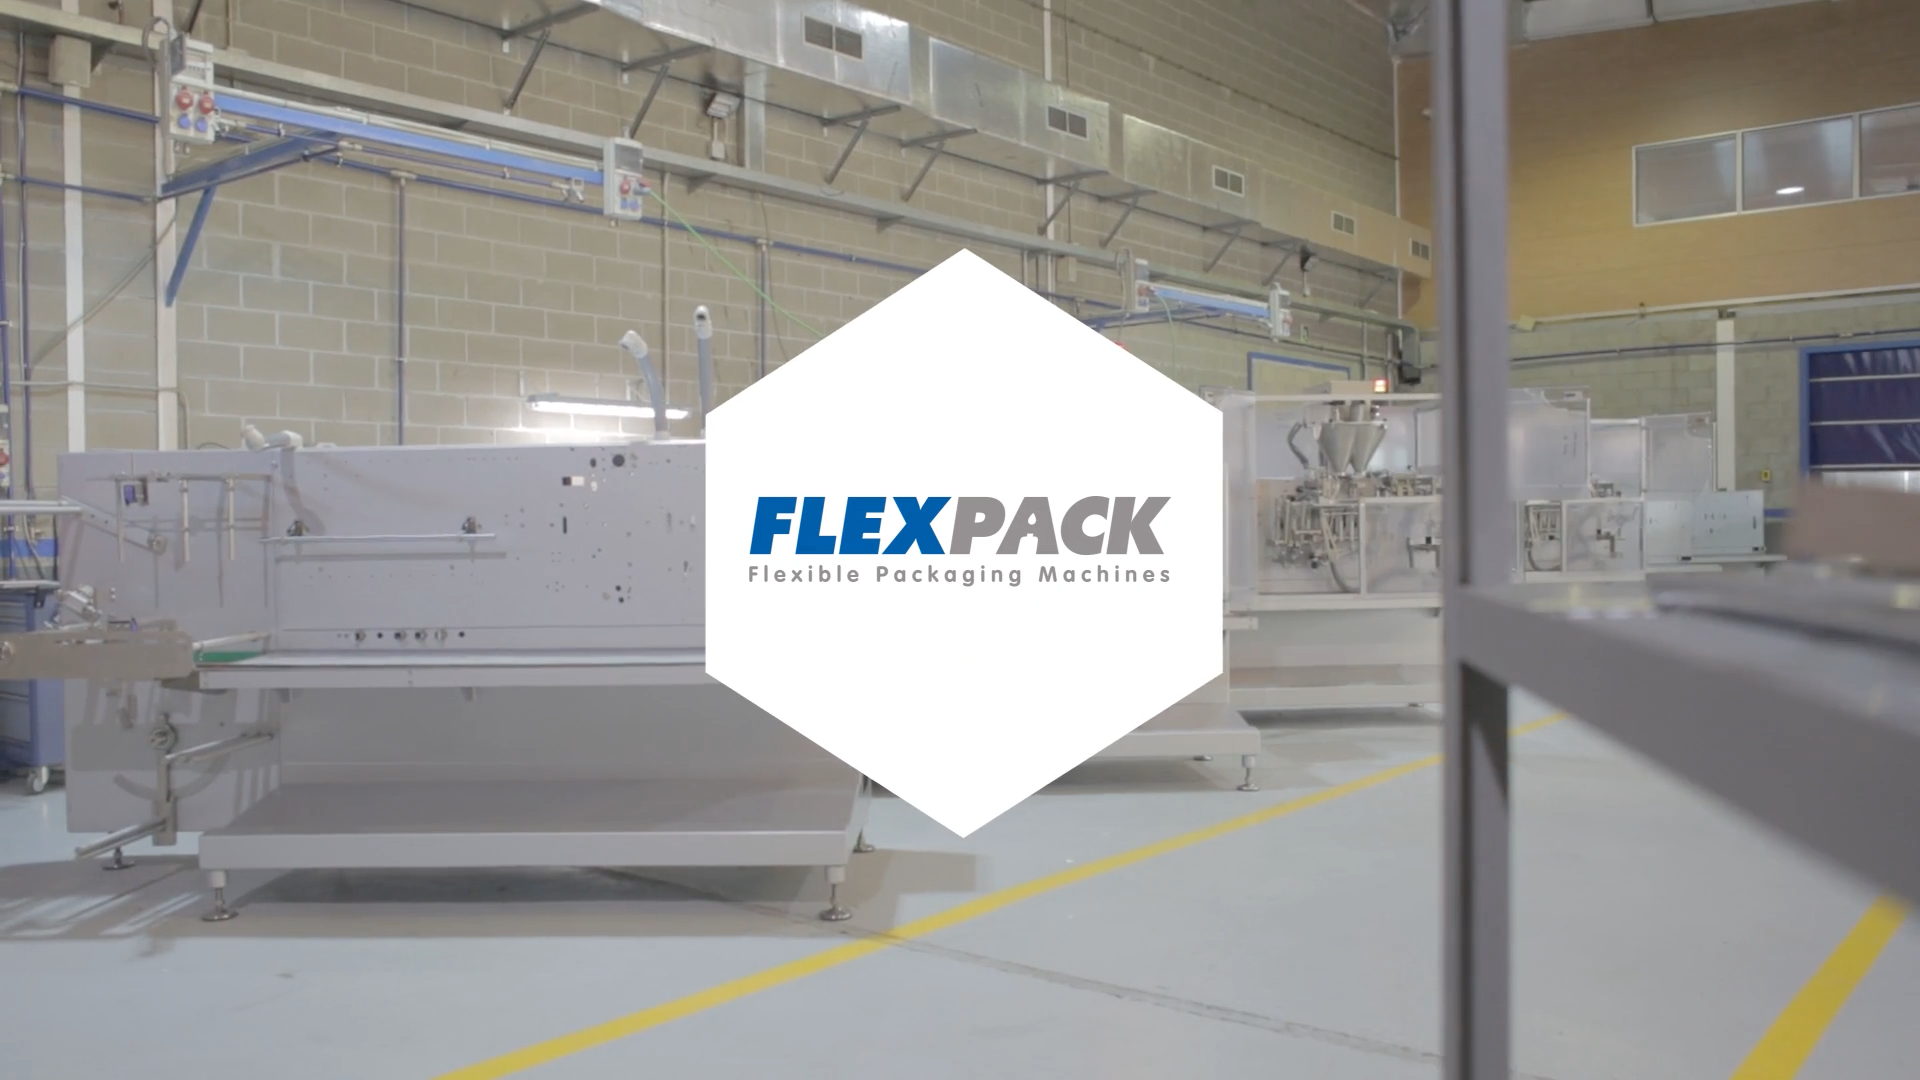 FLEXPACK